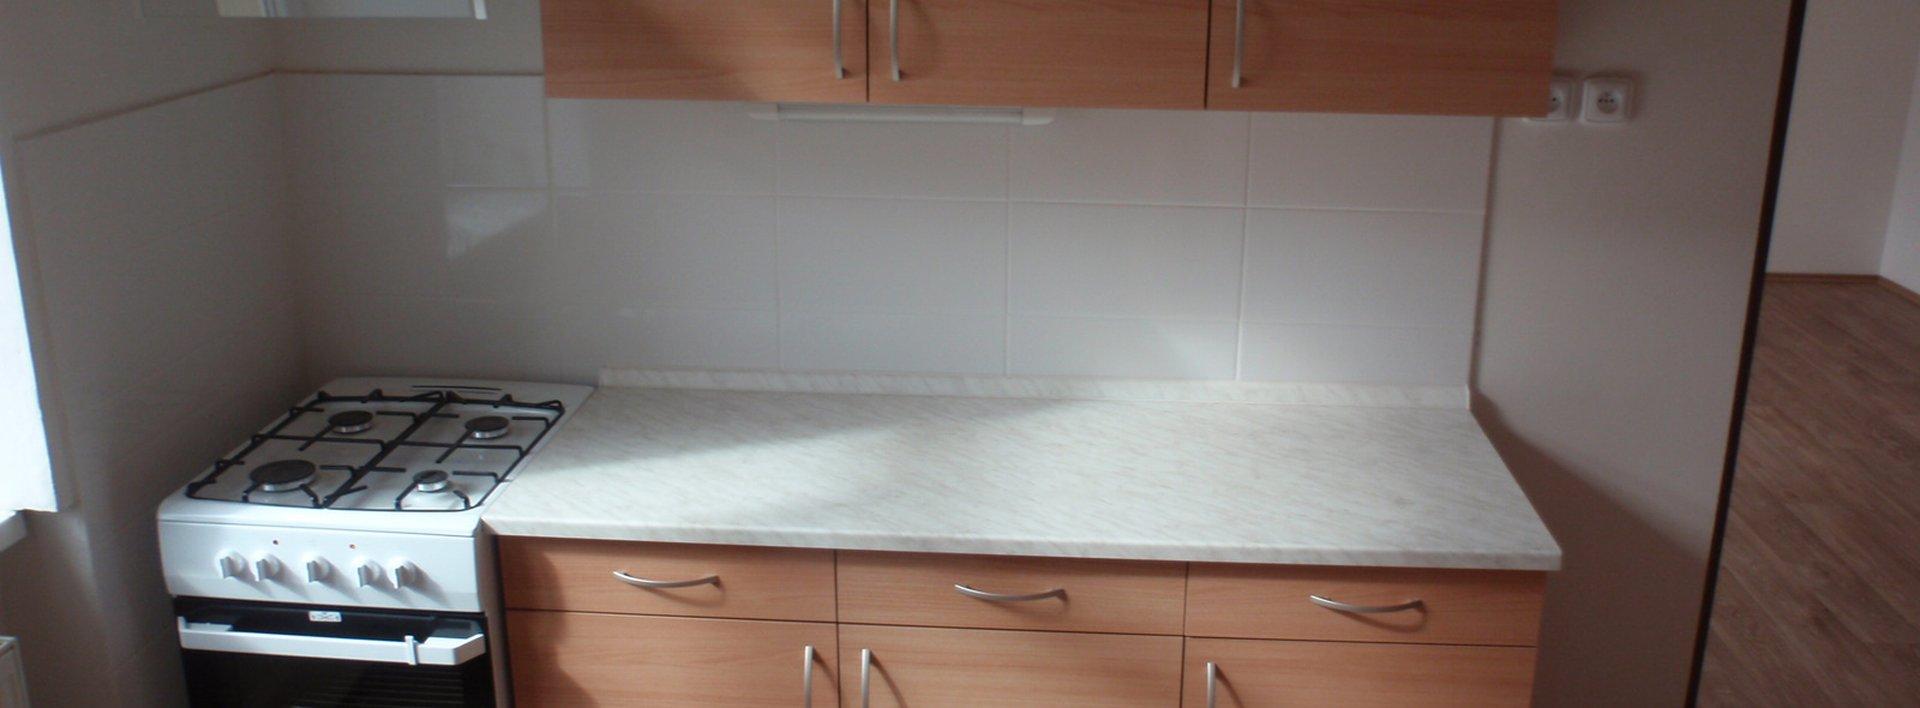 Pronájem bytu 2+1, 55m² - Liberec III-Jeřáb, Ev.č.: N49295